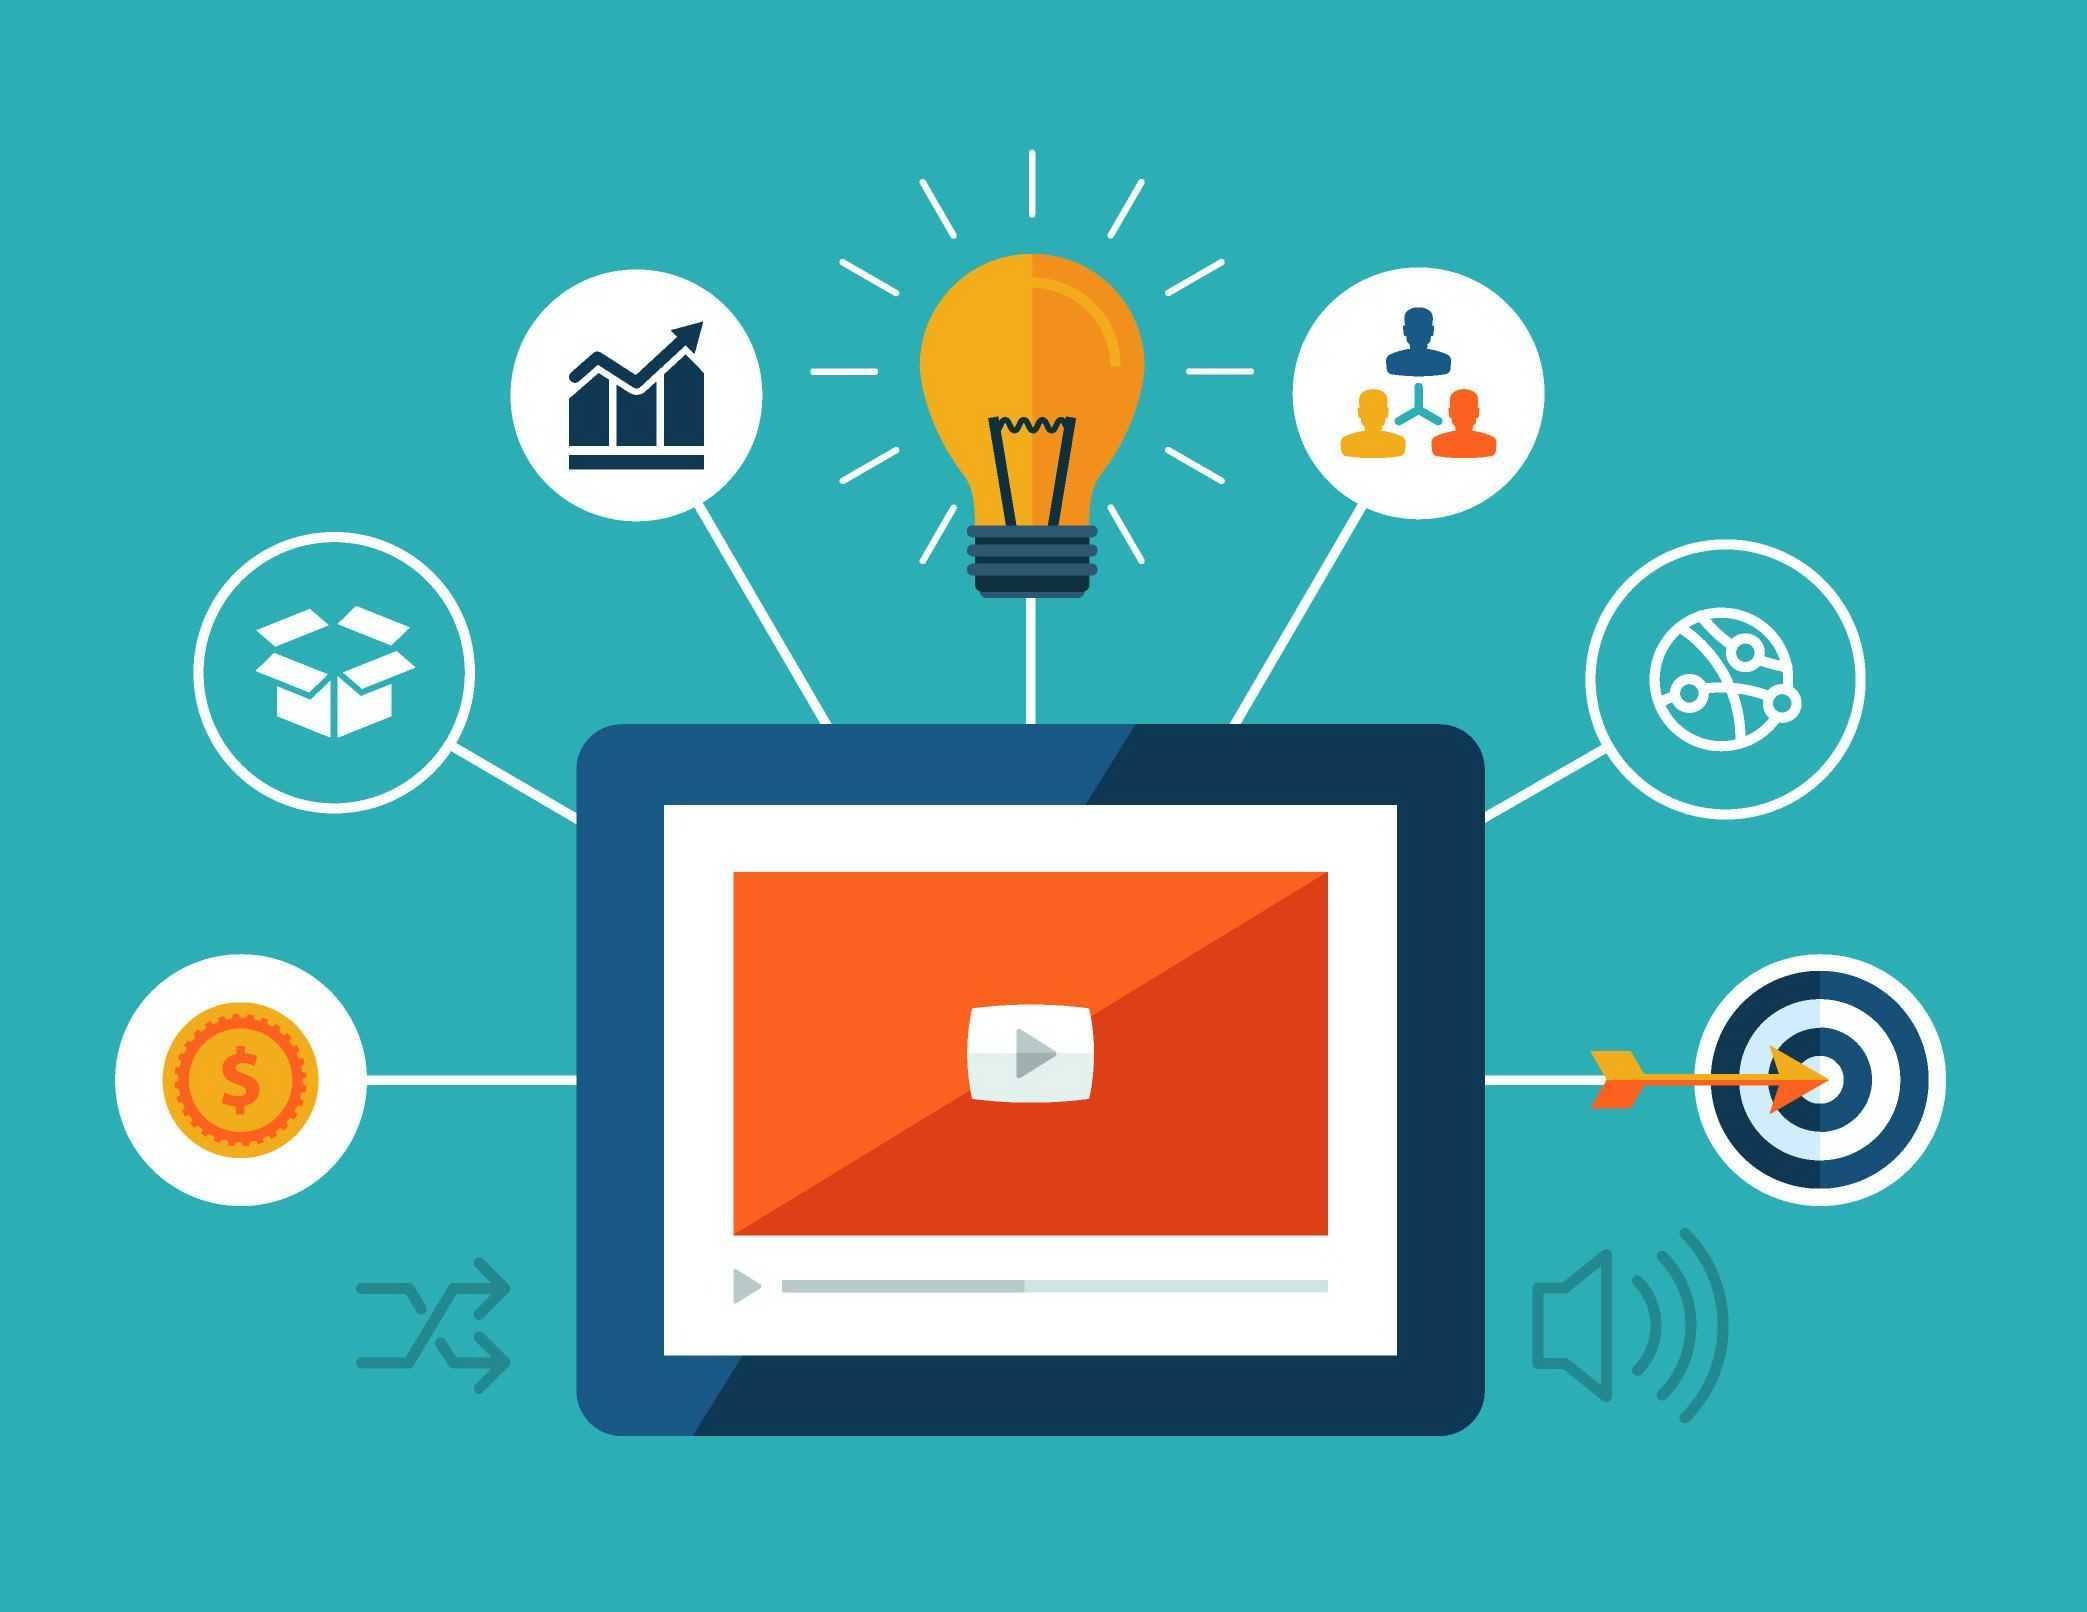 iab-digital-video-ad-effectiveness-case-study-3-e1443643805340 Anlam Bilgisi Soru Tipleri